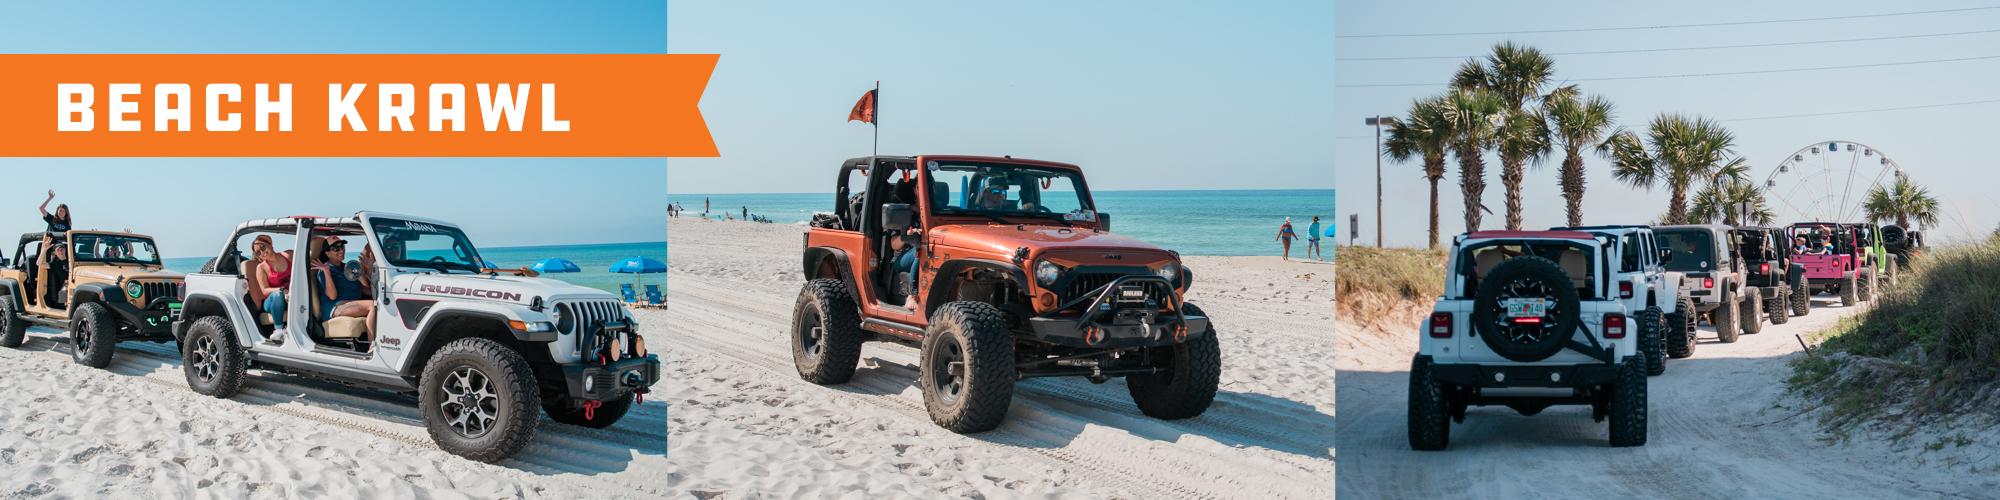 Beach Rurtle Krawl